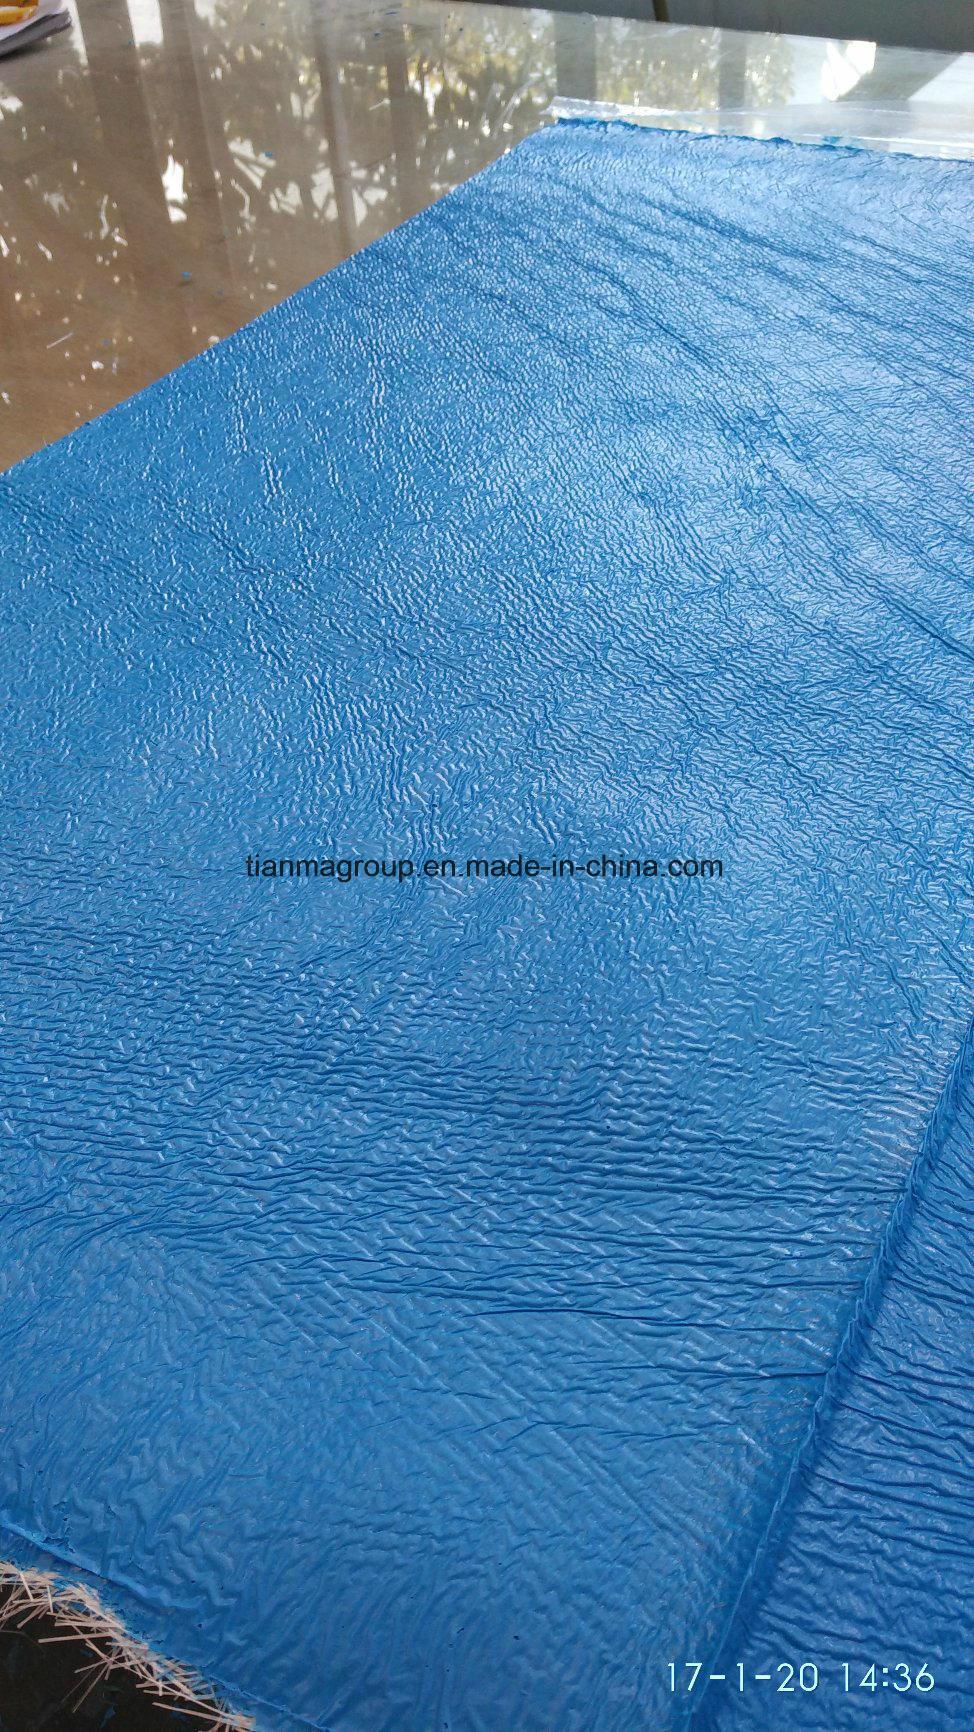 Fiber Glass Reinforced Sheet, Sheet Moulding Compound SMC